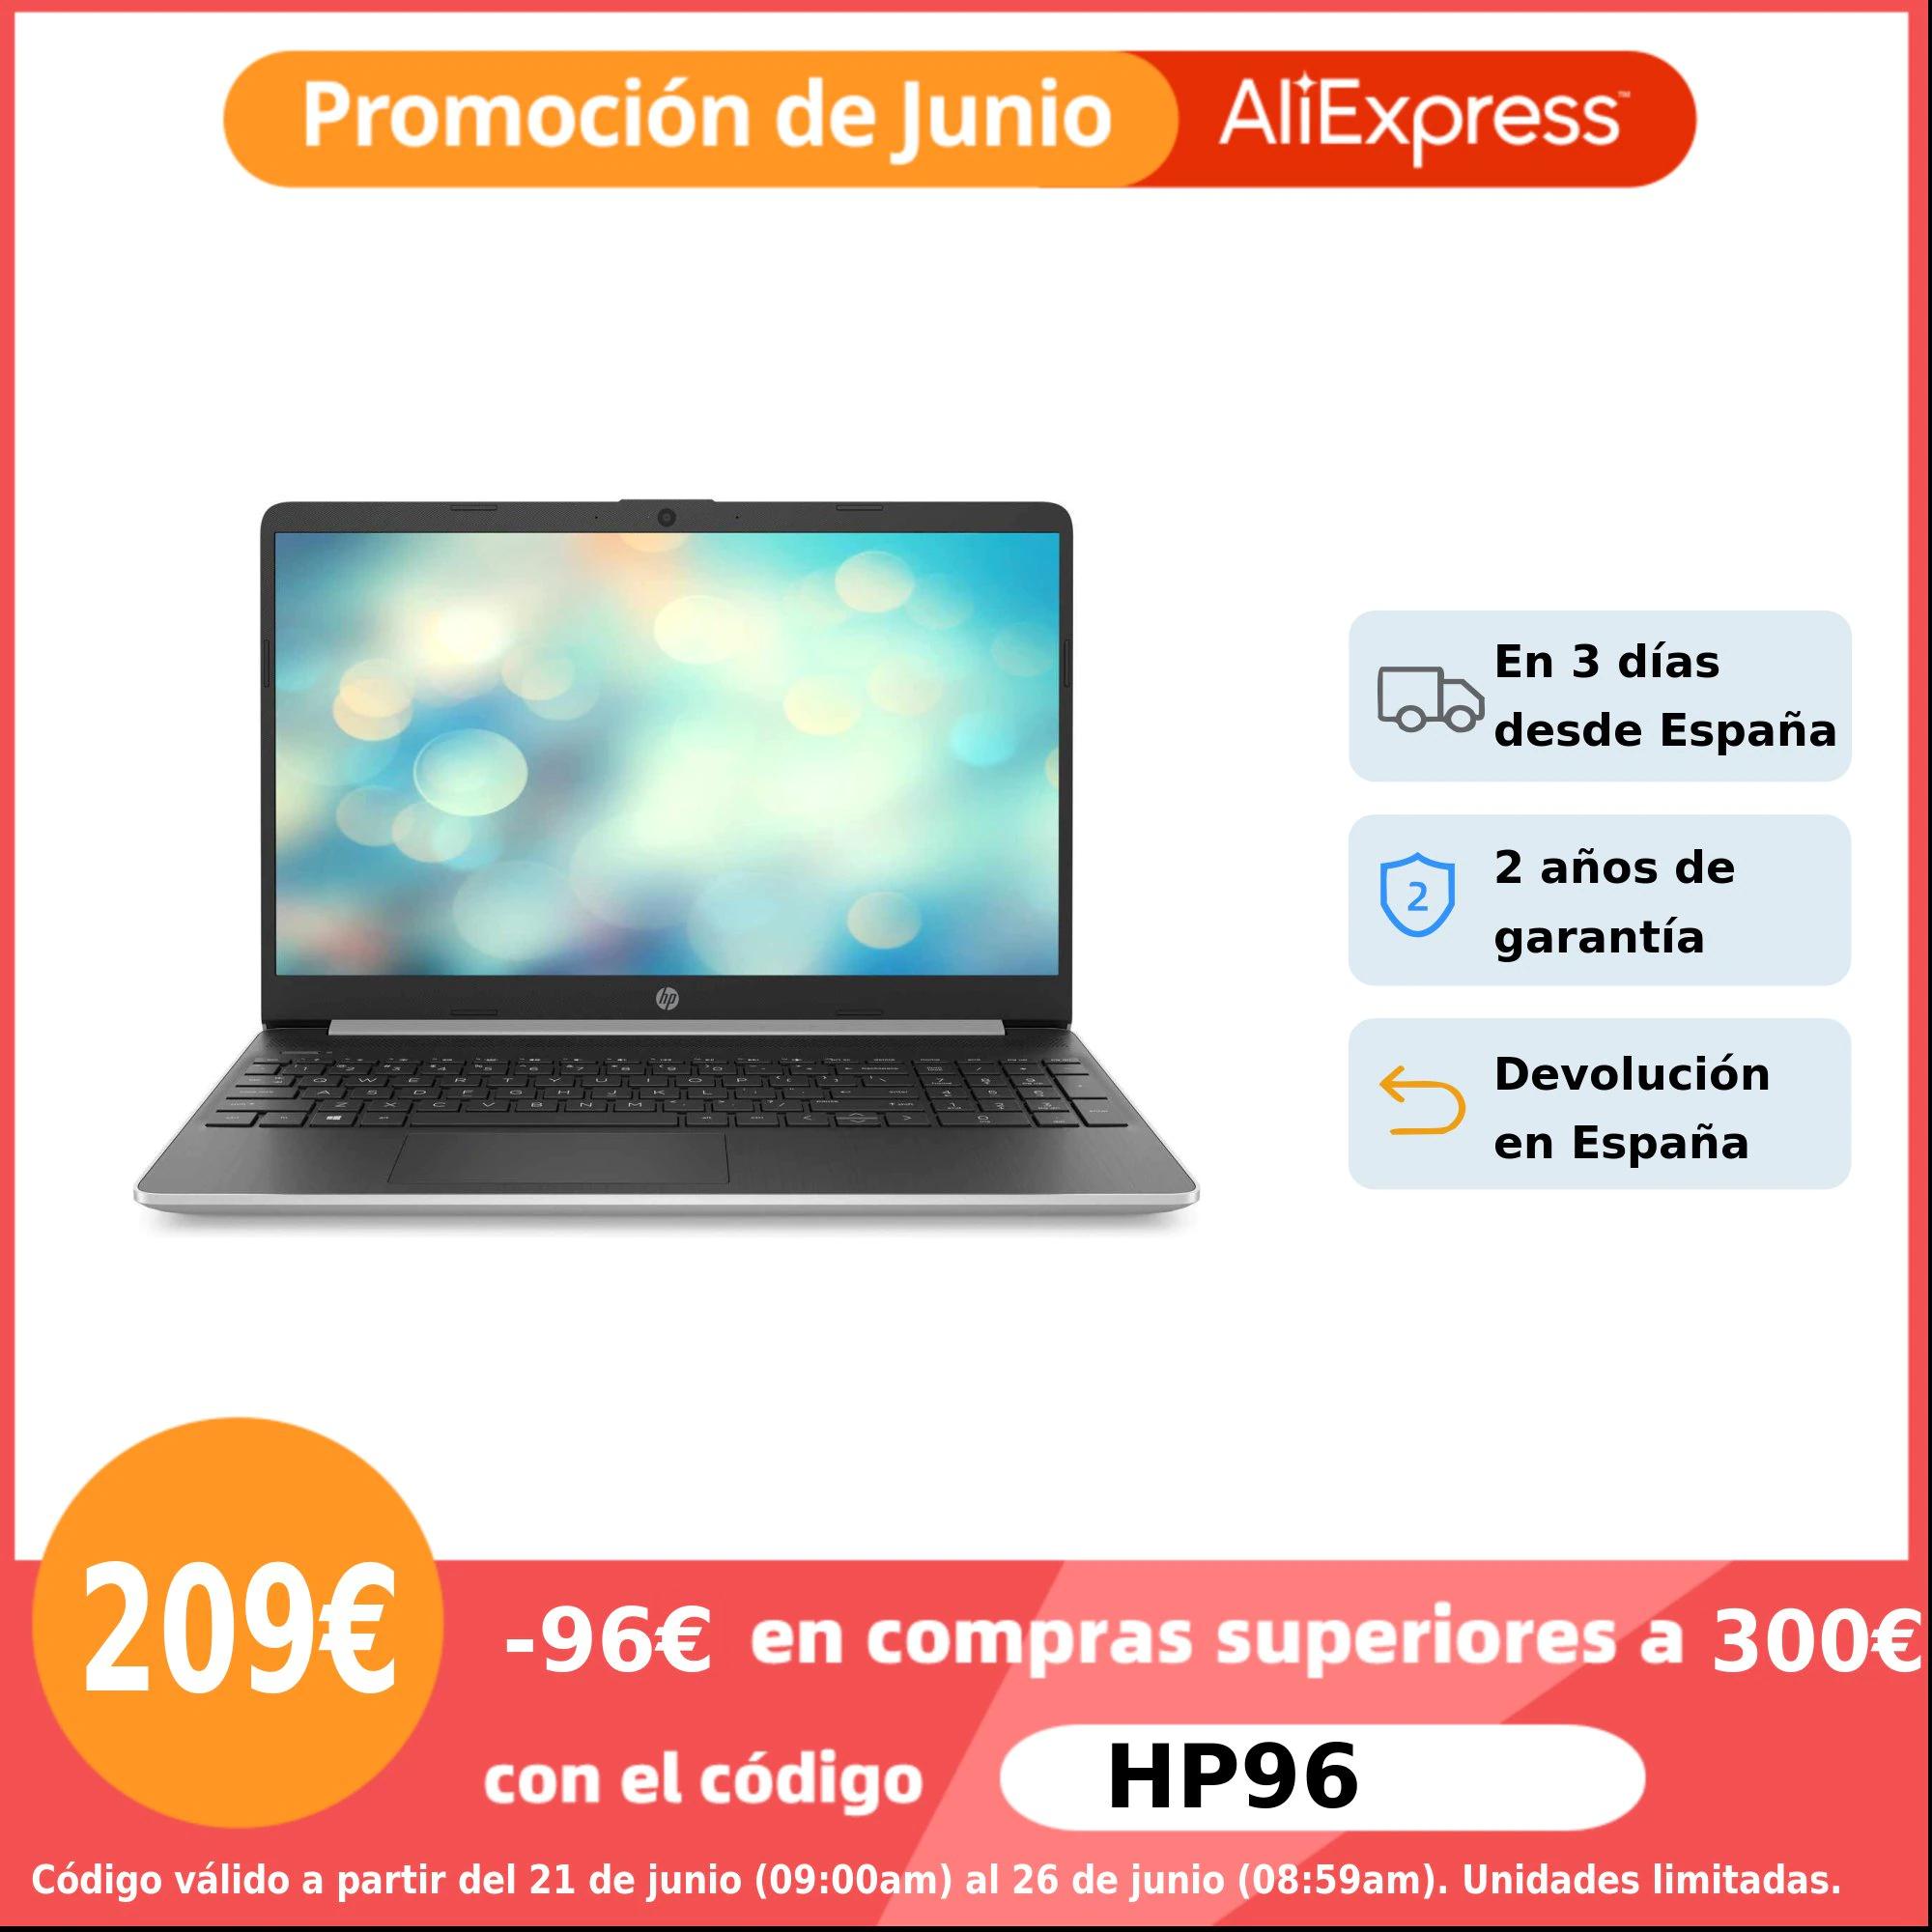 "Ordenador portátil HP 15s-fq0000ns, 15.6"" HD, Intel Celeron N4020, 8GB RAM, 256GB SSD, UHD Graphics, FreeDOS, Teclado con 'ñ'"